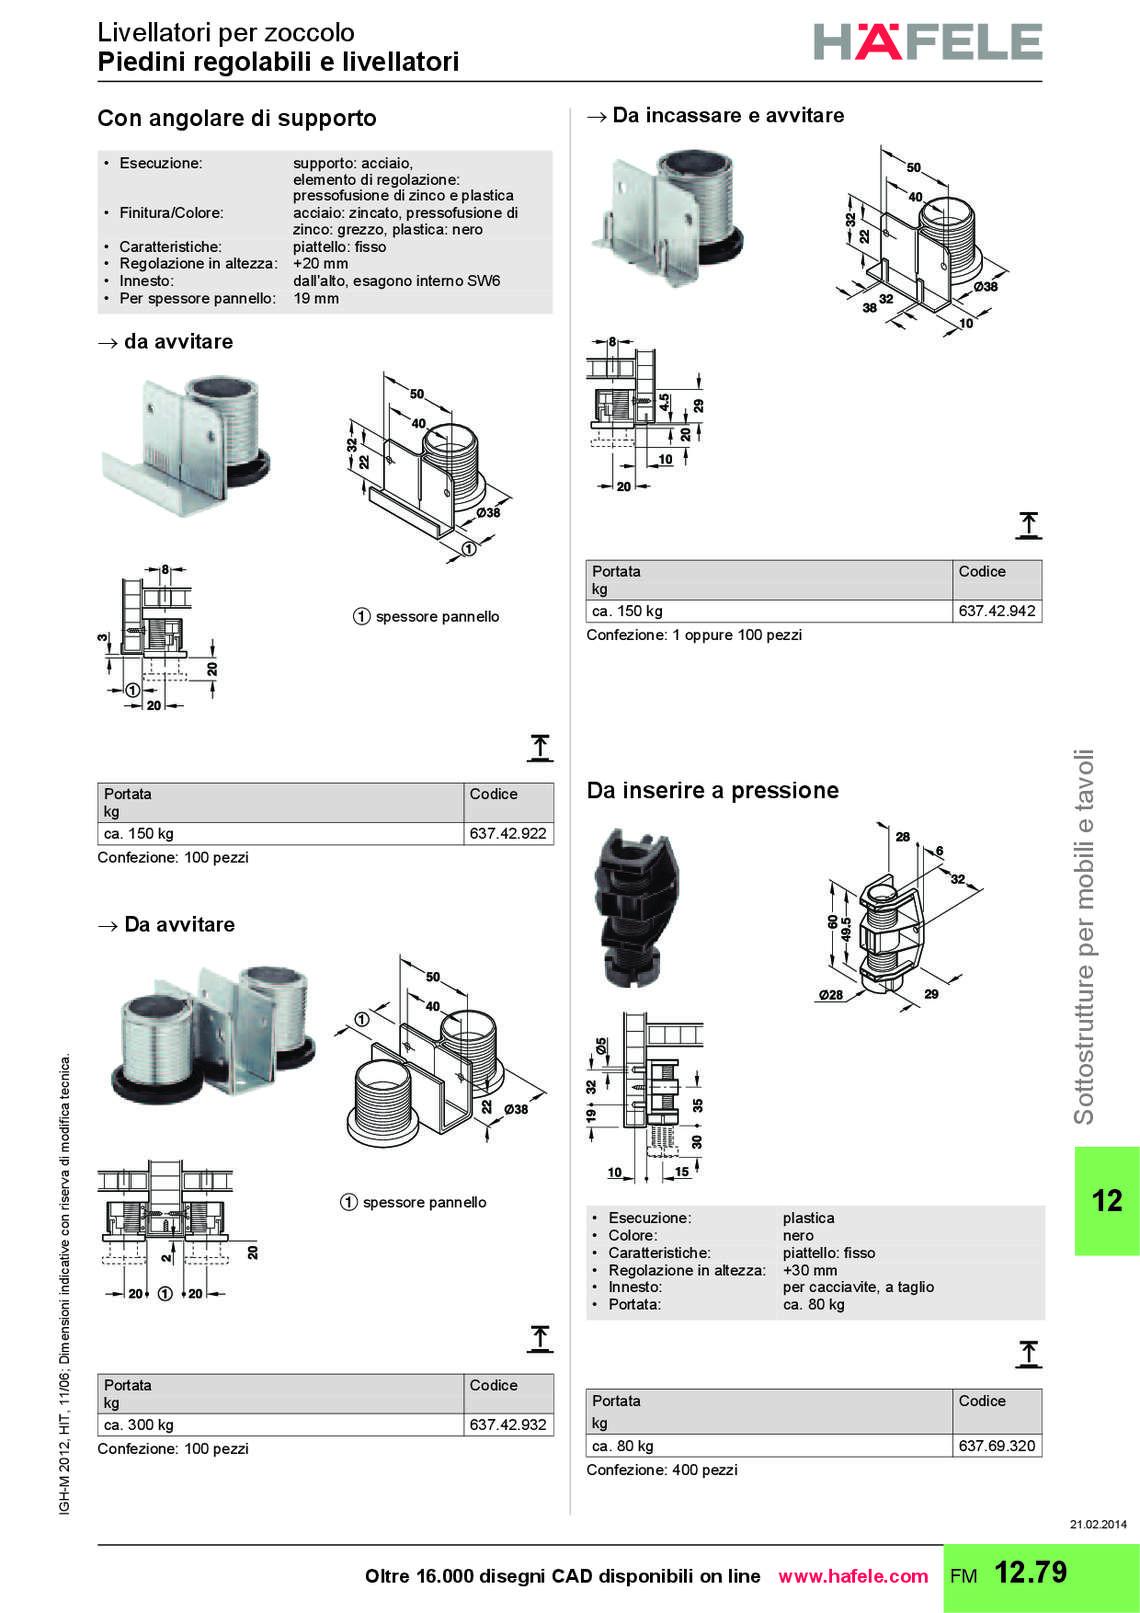 hafele-sottostrutture-per-mobili_83_102.jpg